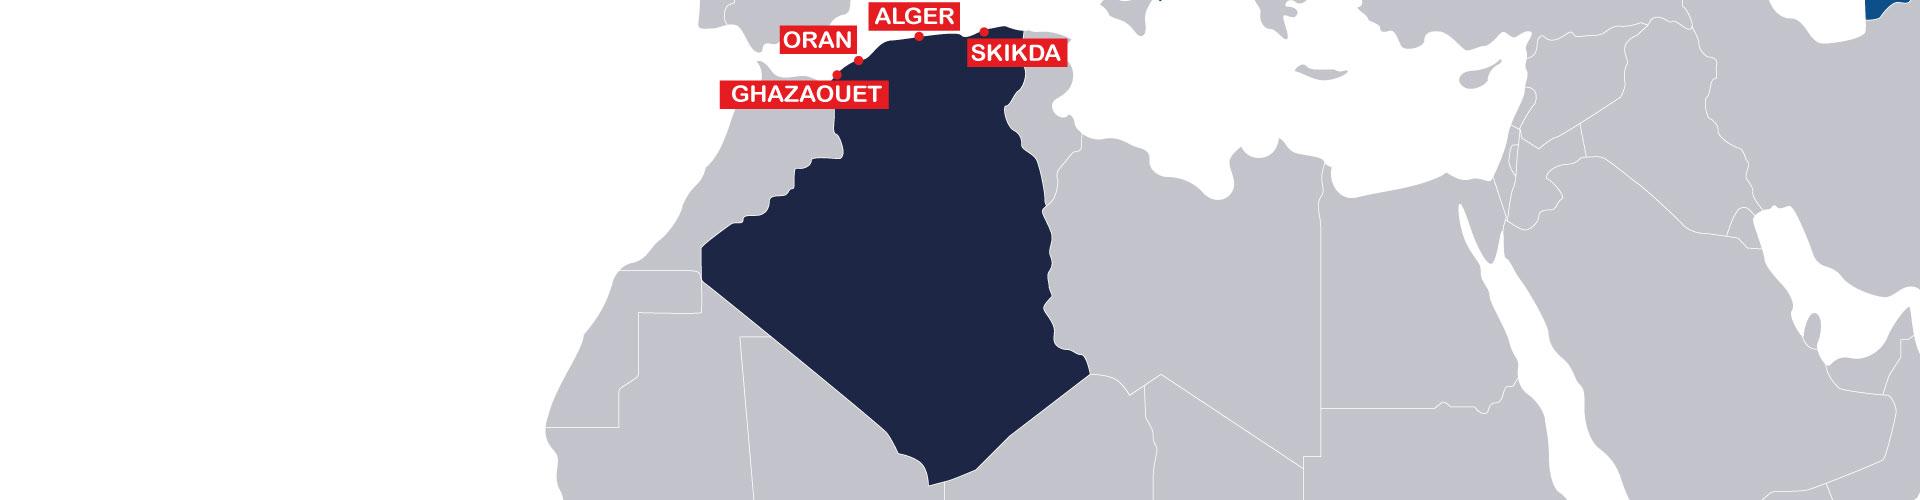 MAP ALGERIA FR.jpg